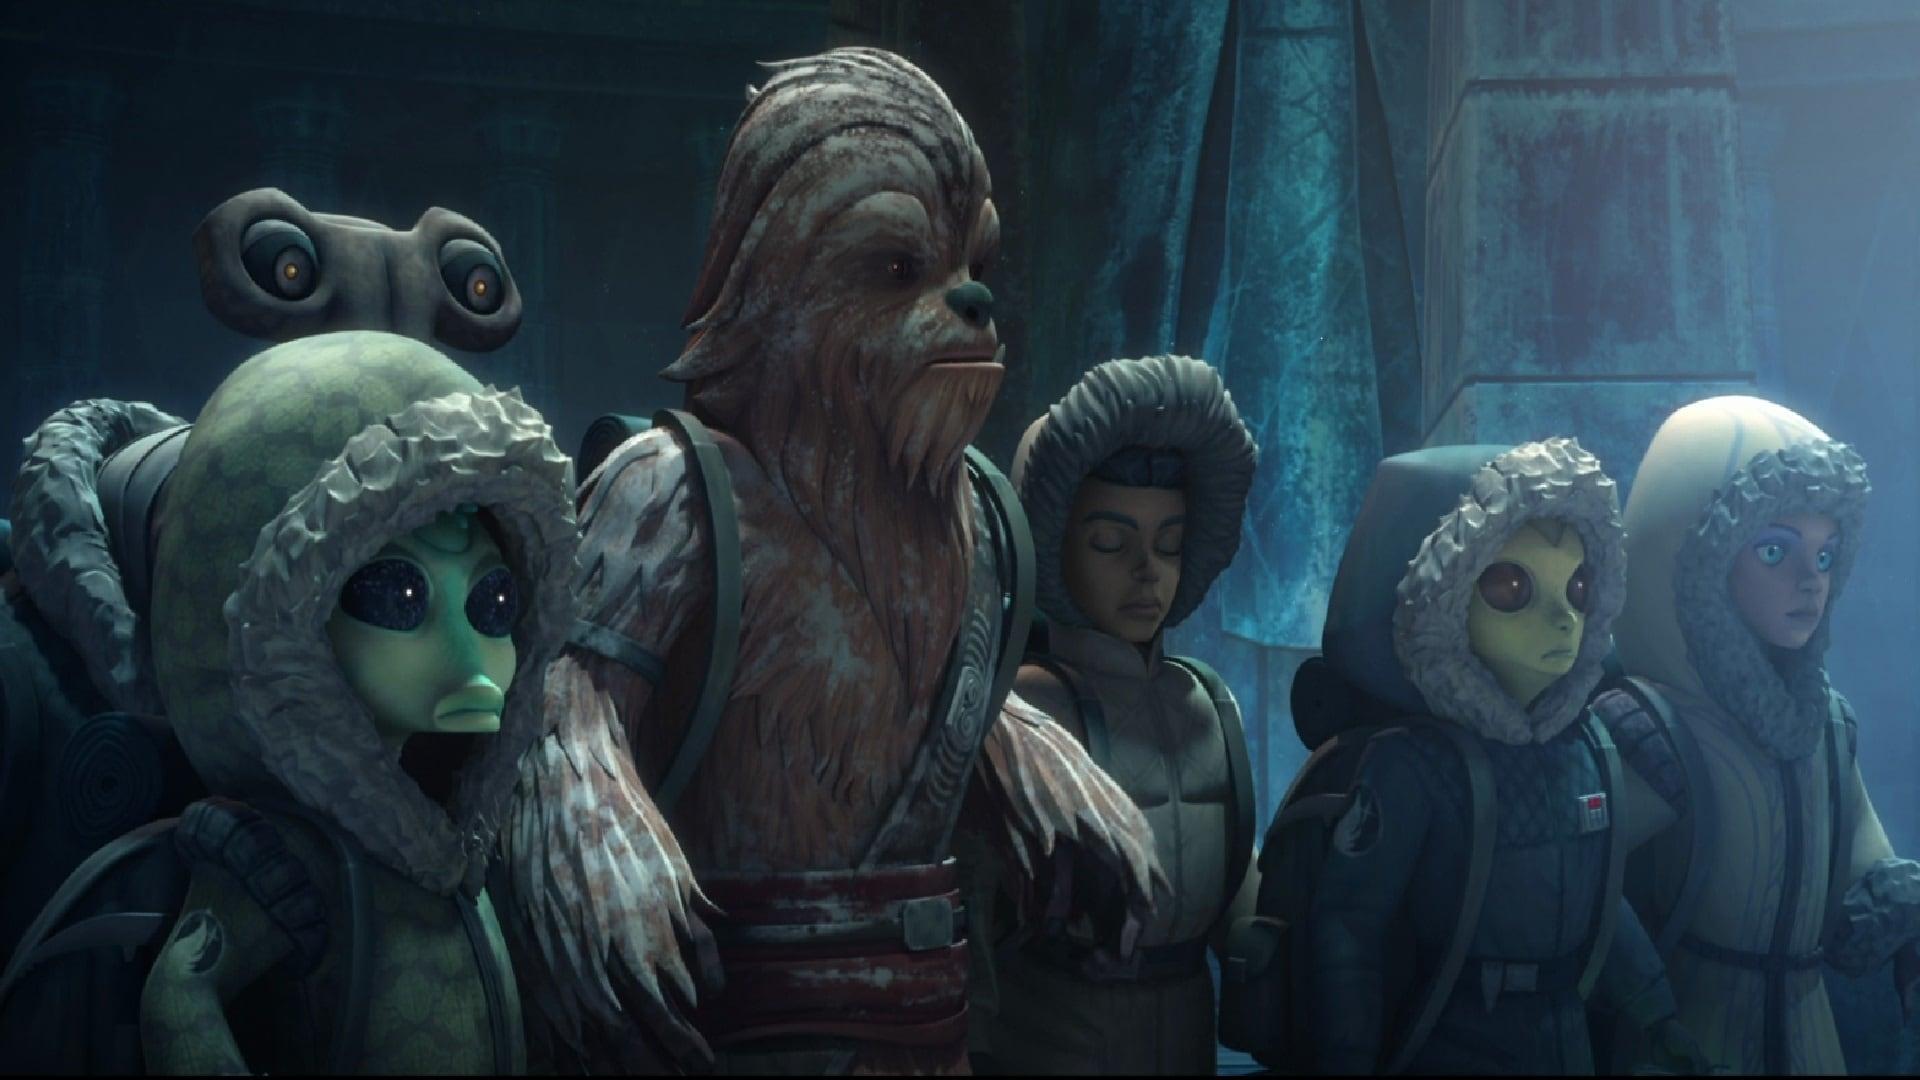 Star Wars: The Clone Wars - Season 5 Episode 6 : The Gathering